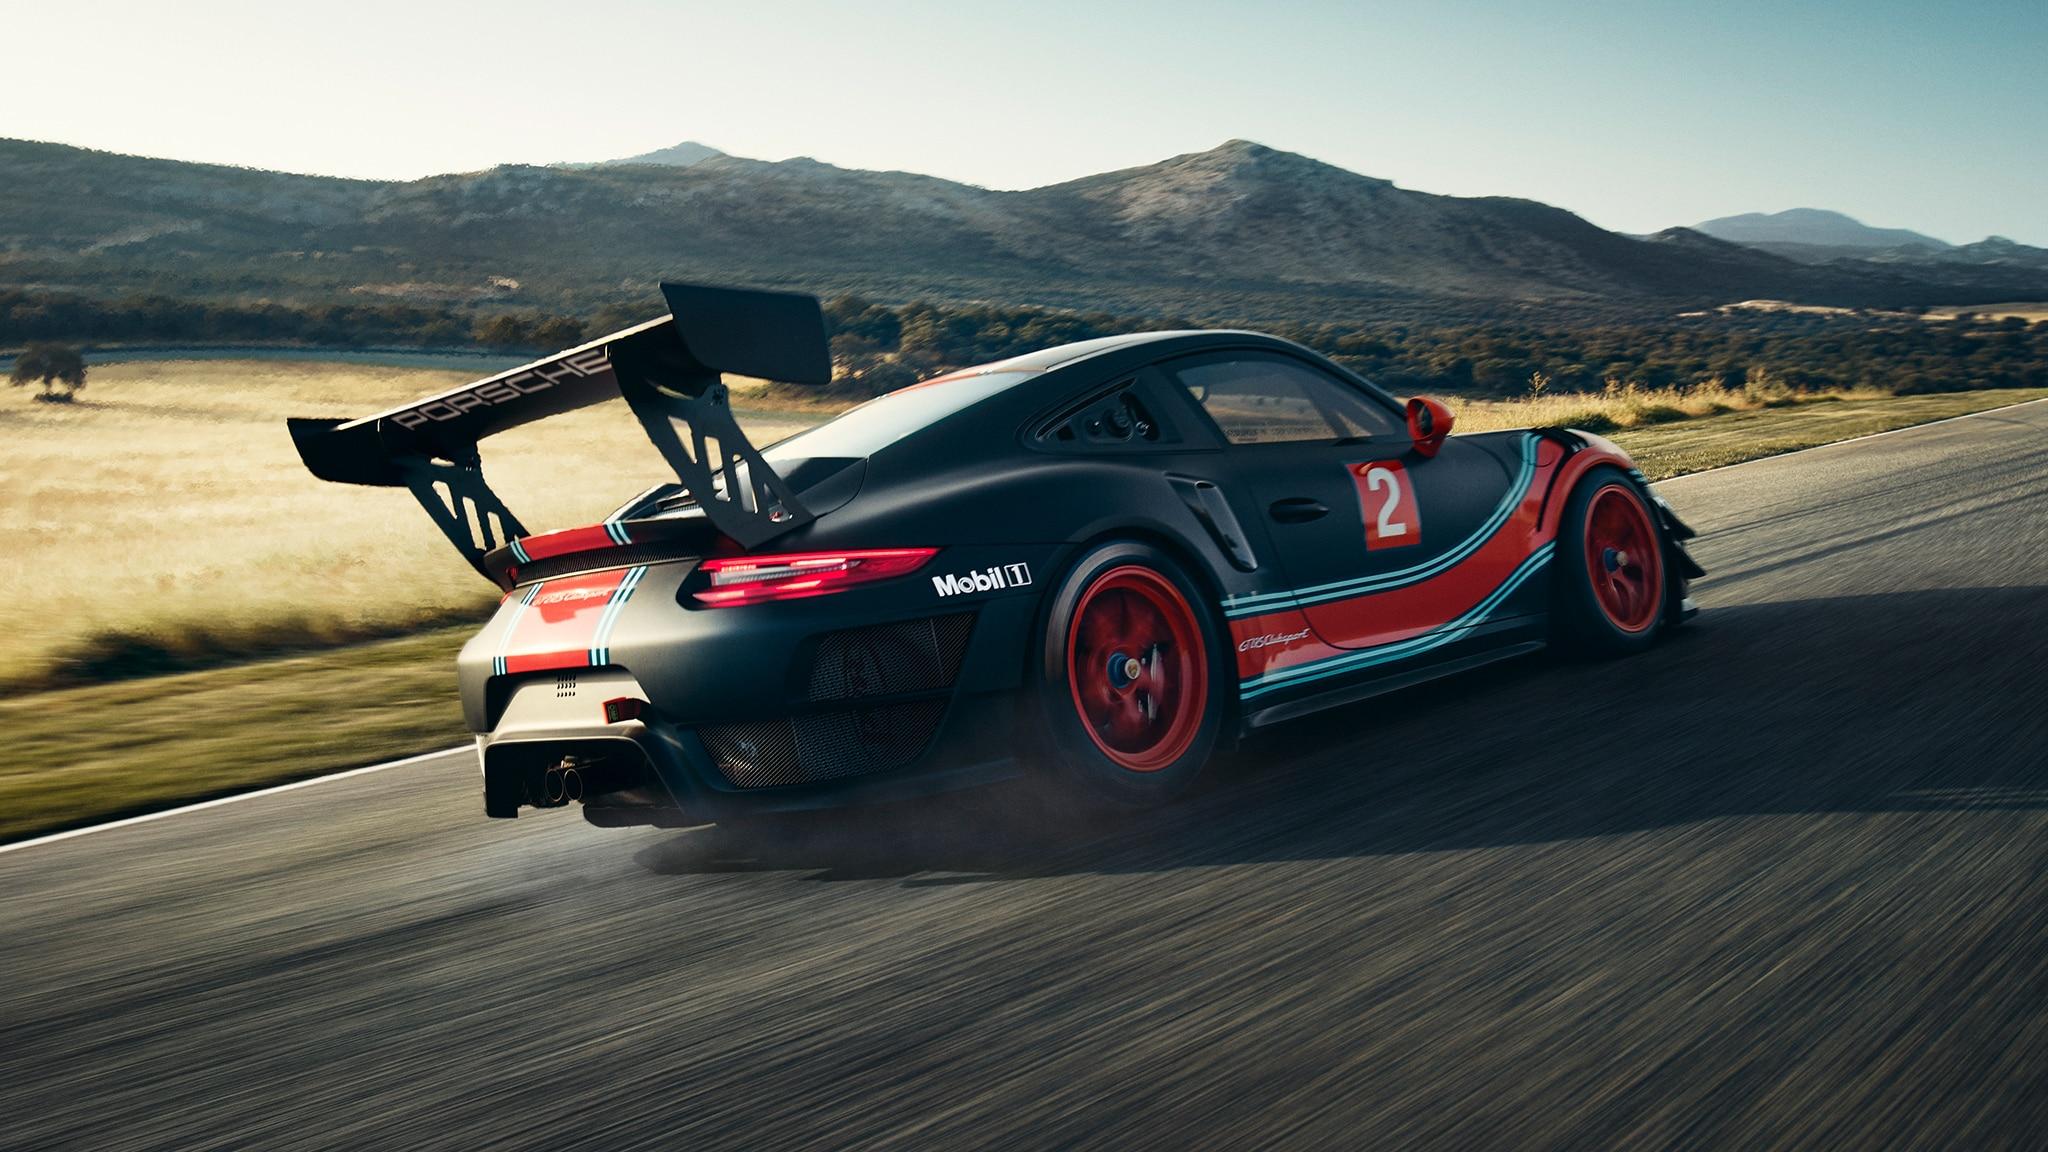 Porsche 911 GT2 RS Clubsport Rear Side Motion View